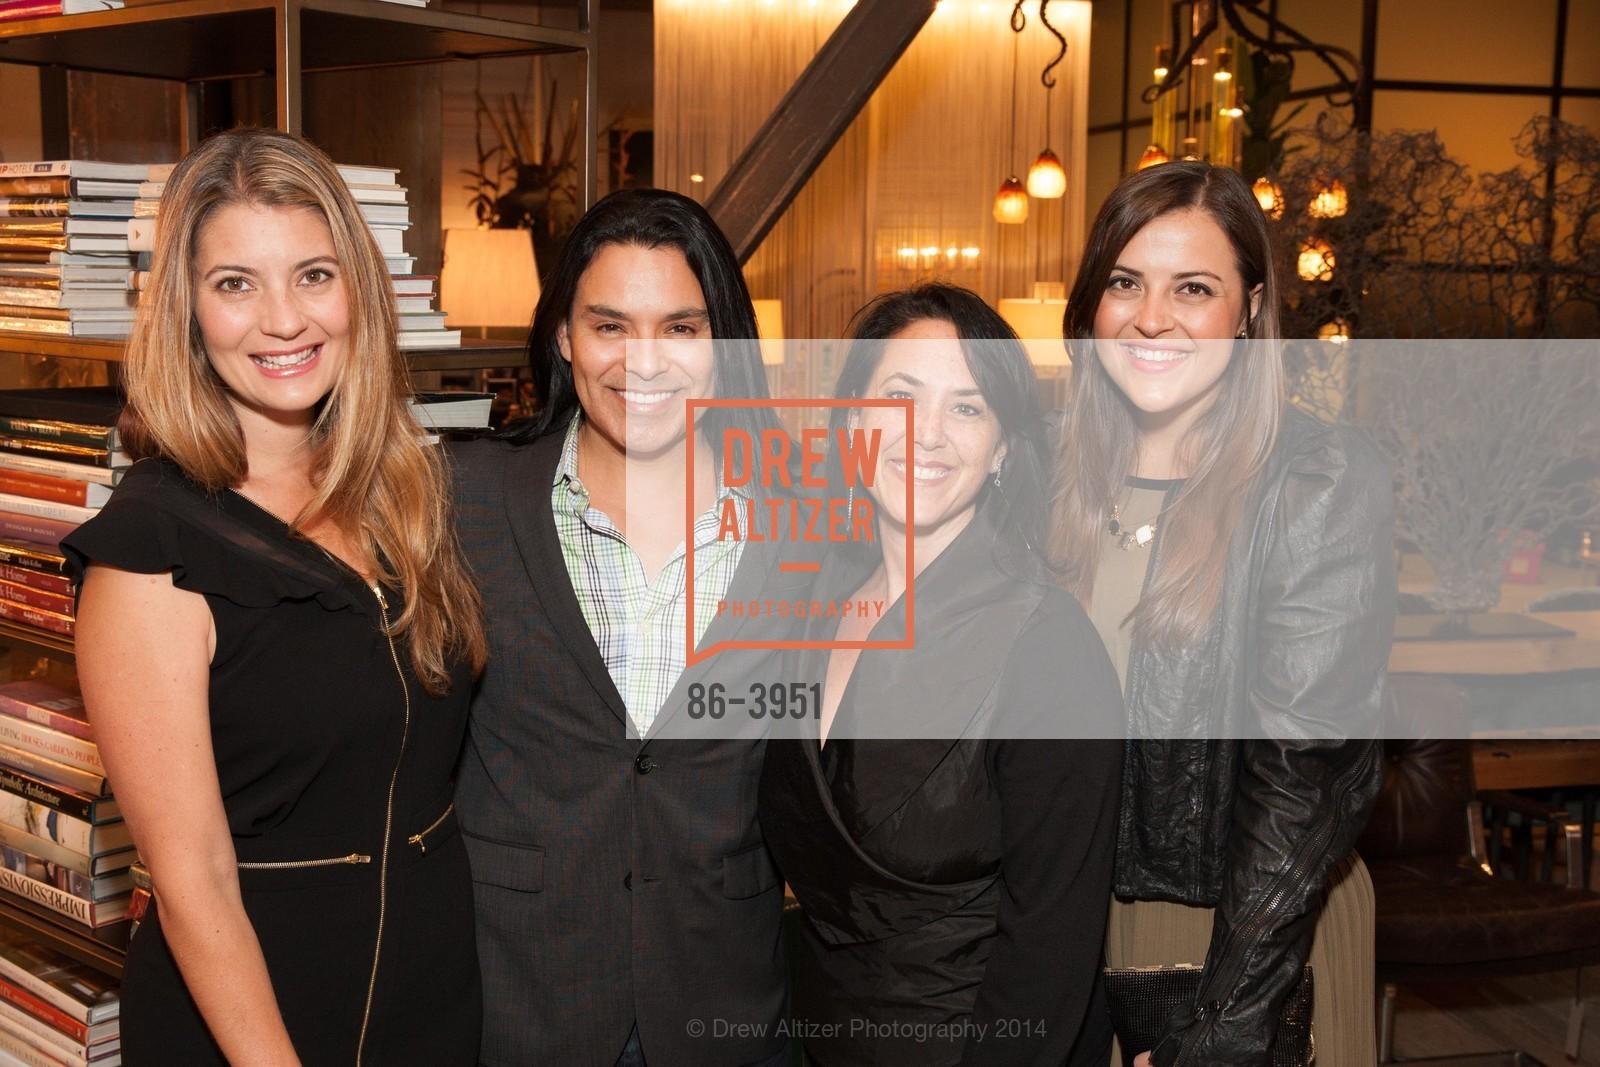 Brooke McClaren, Tony Estrada, Shannon Radcliffe, Brittany Watson, Photo #86-3951